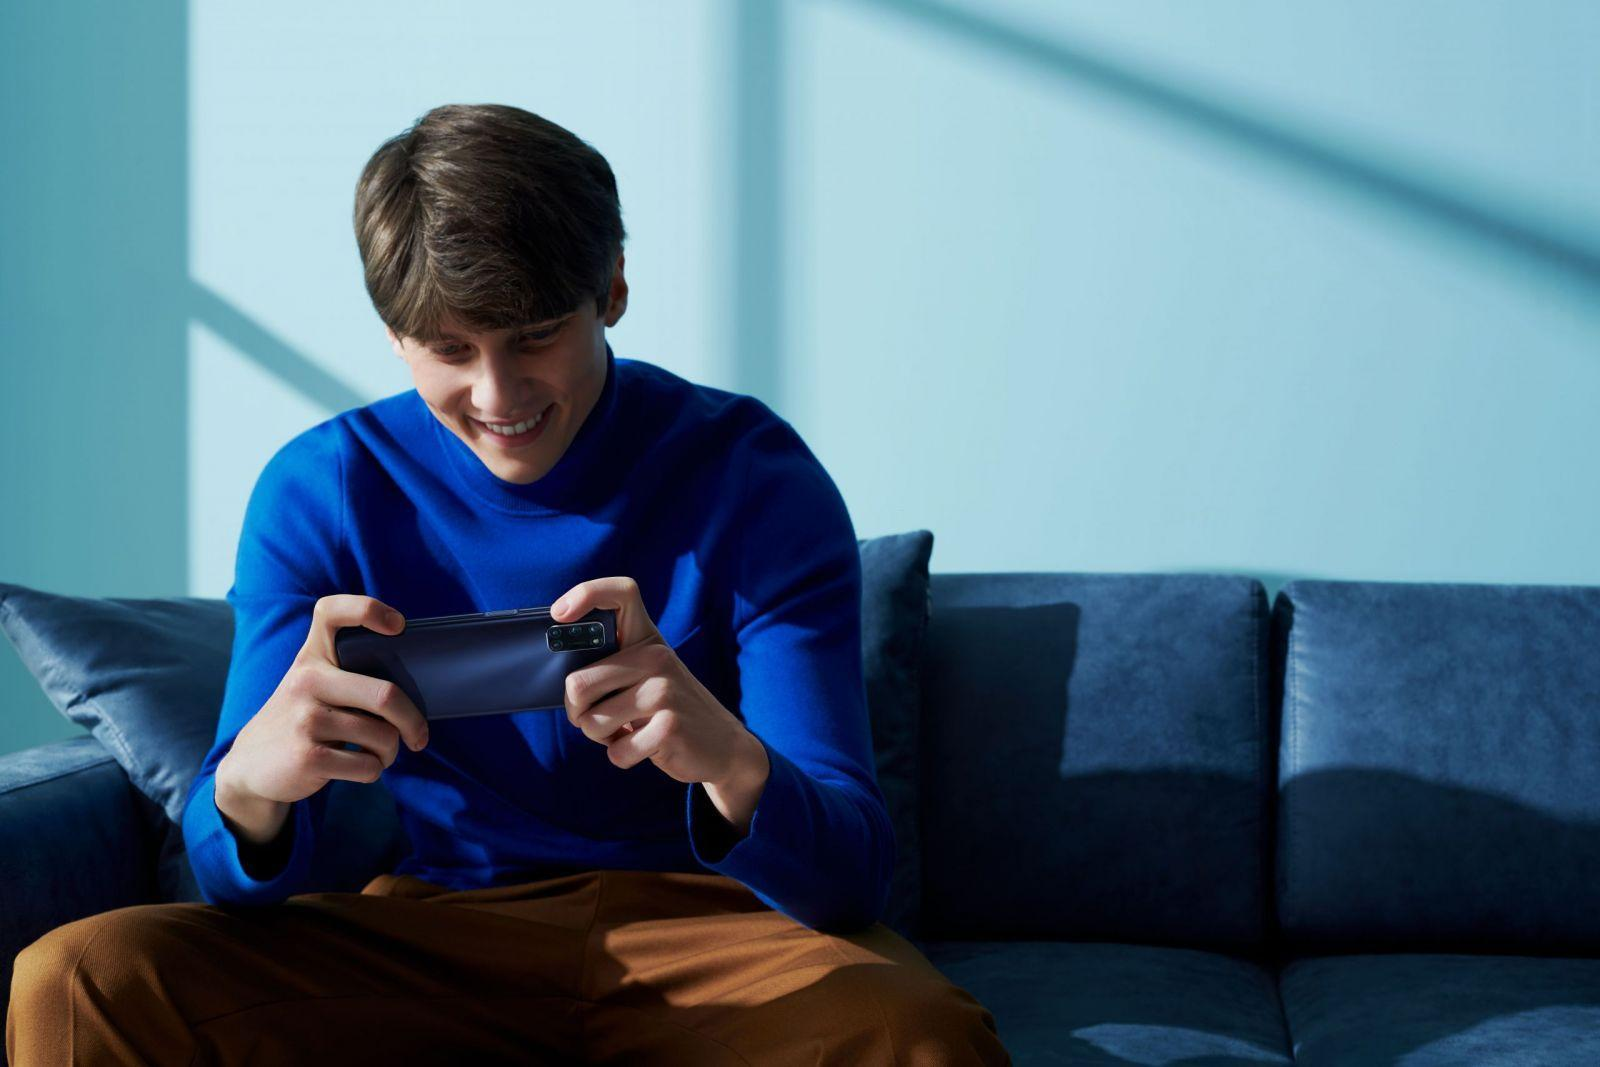 OPPO выпустила недорогой смартфон OPPO A72 с мощным аккумулятором (a72 scenario pictures 3 scaled)